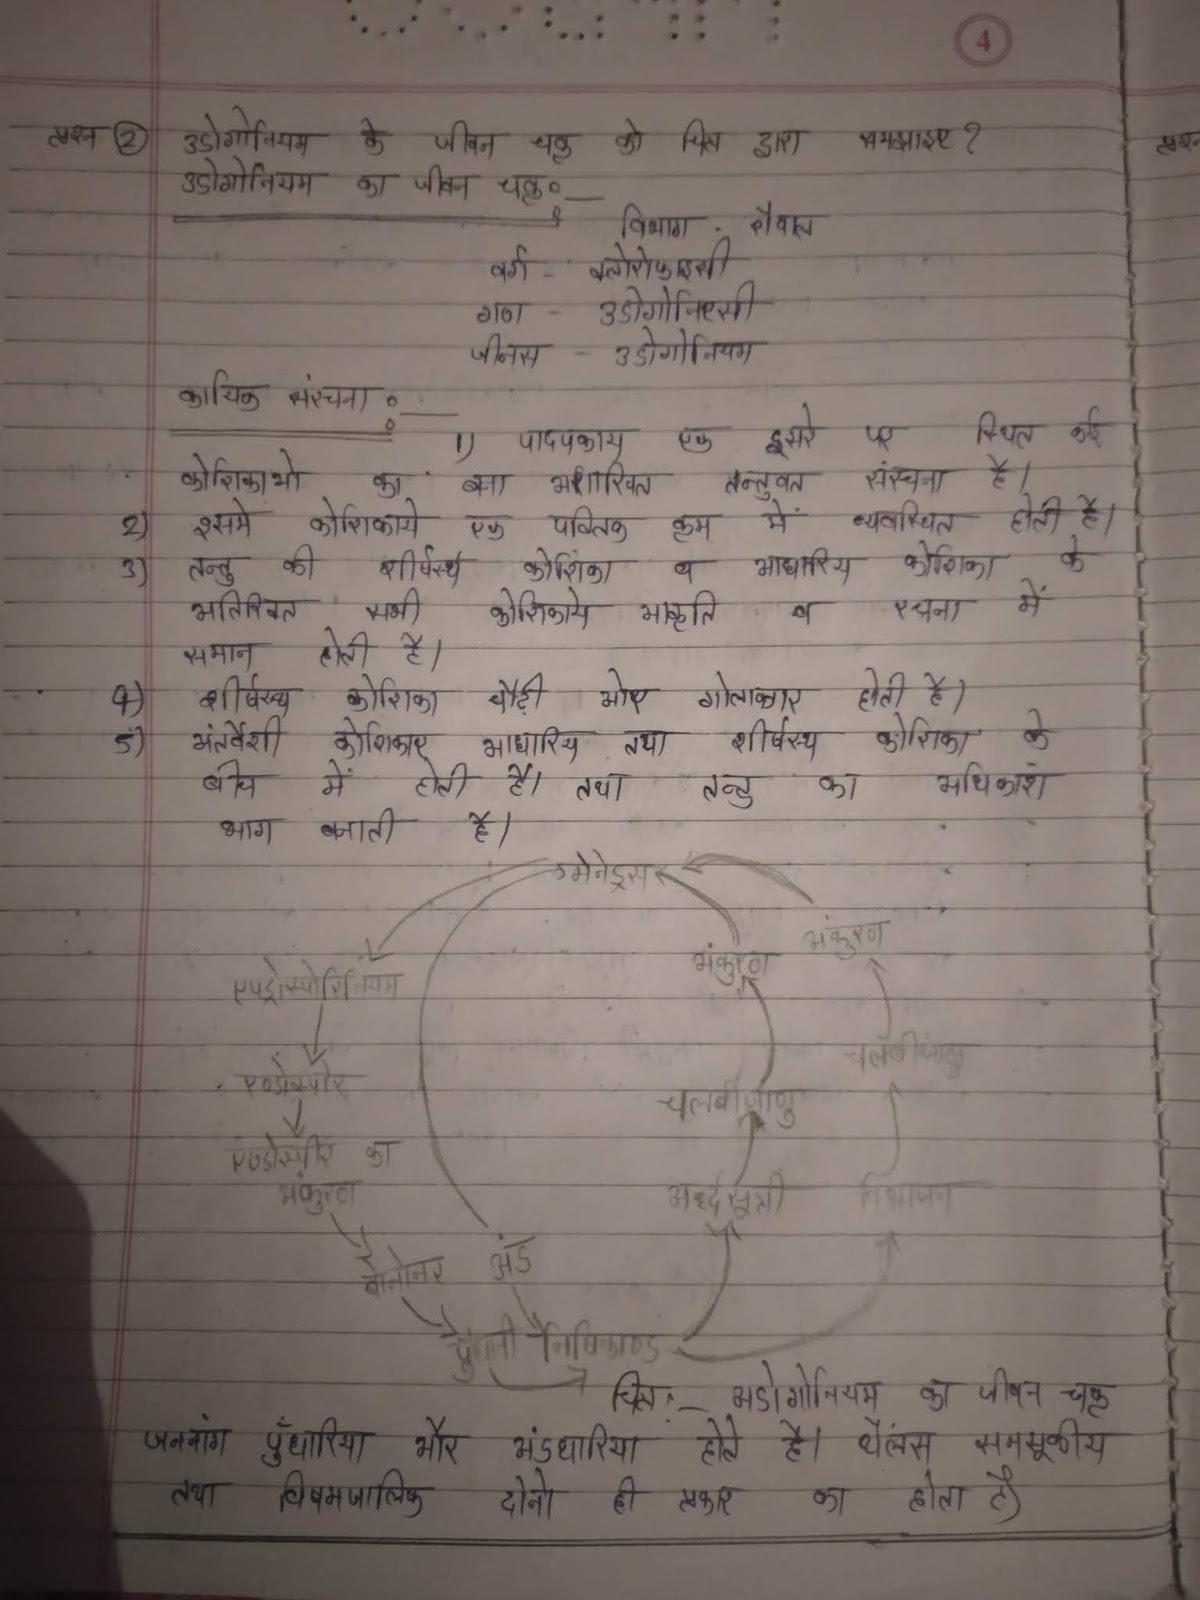 Bhoj University bsc 1st year assignment answer 2018-19: Bhoj